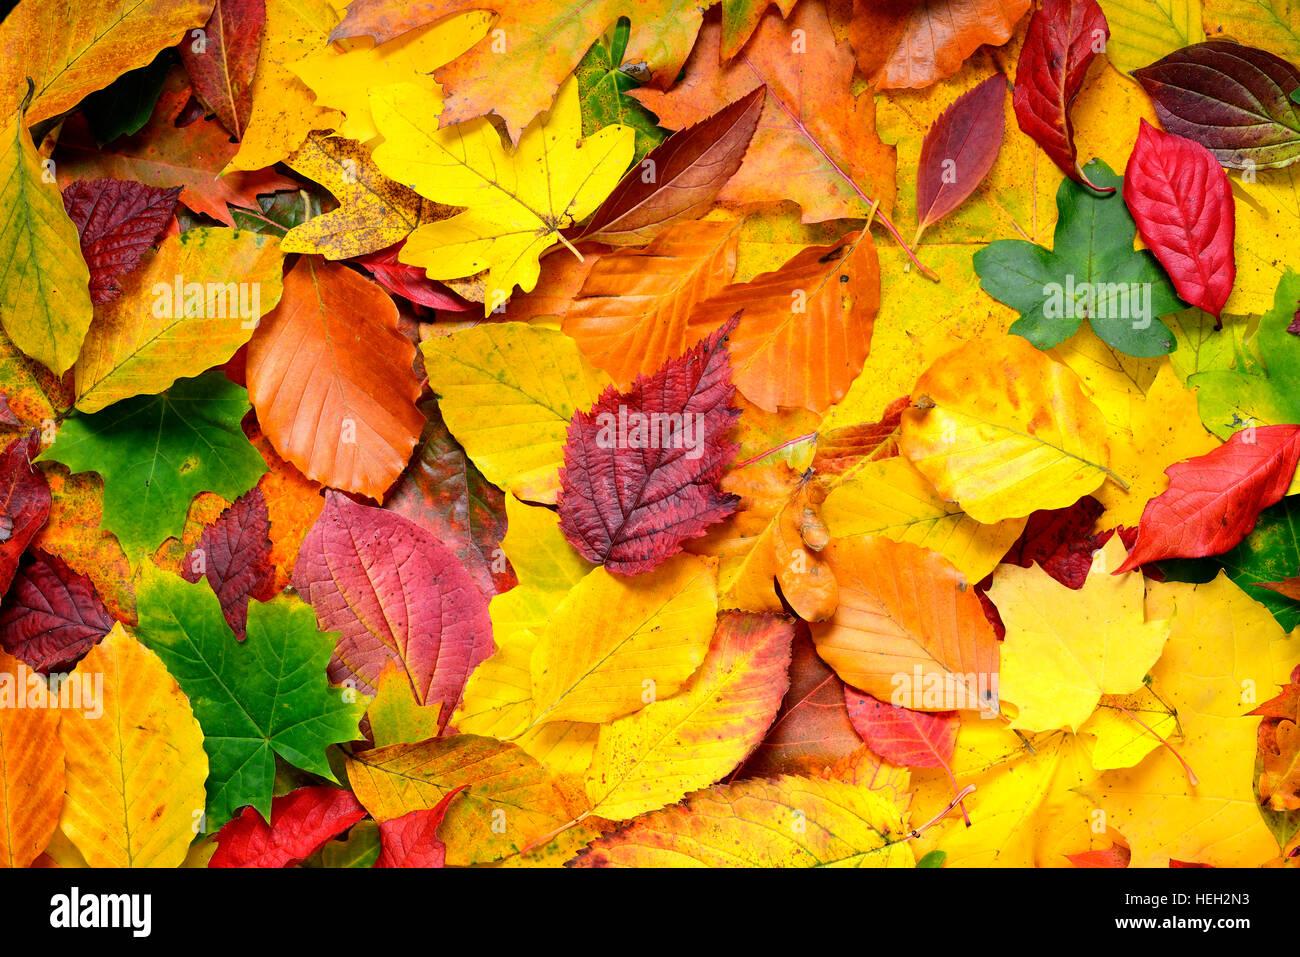 Bunte Herbstblaetter Immagini Stock